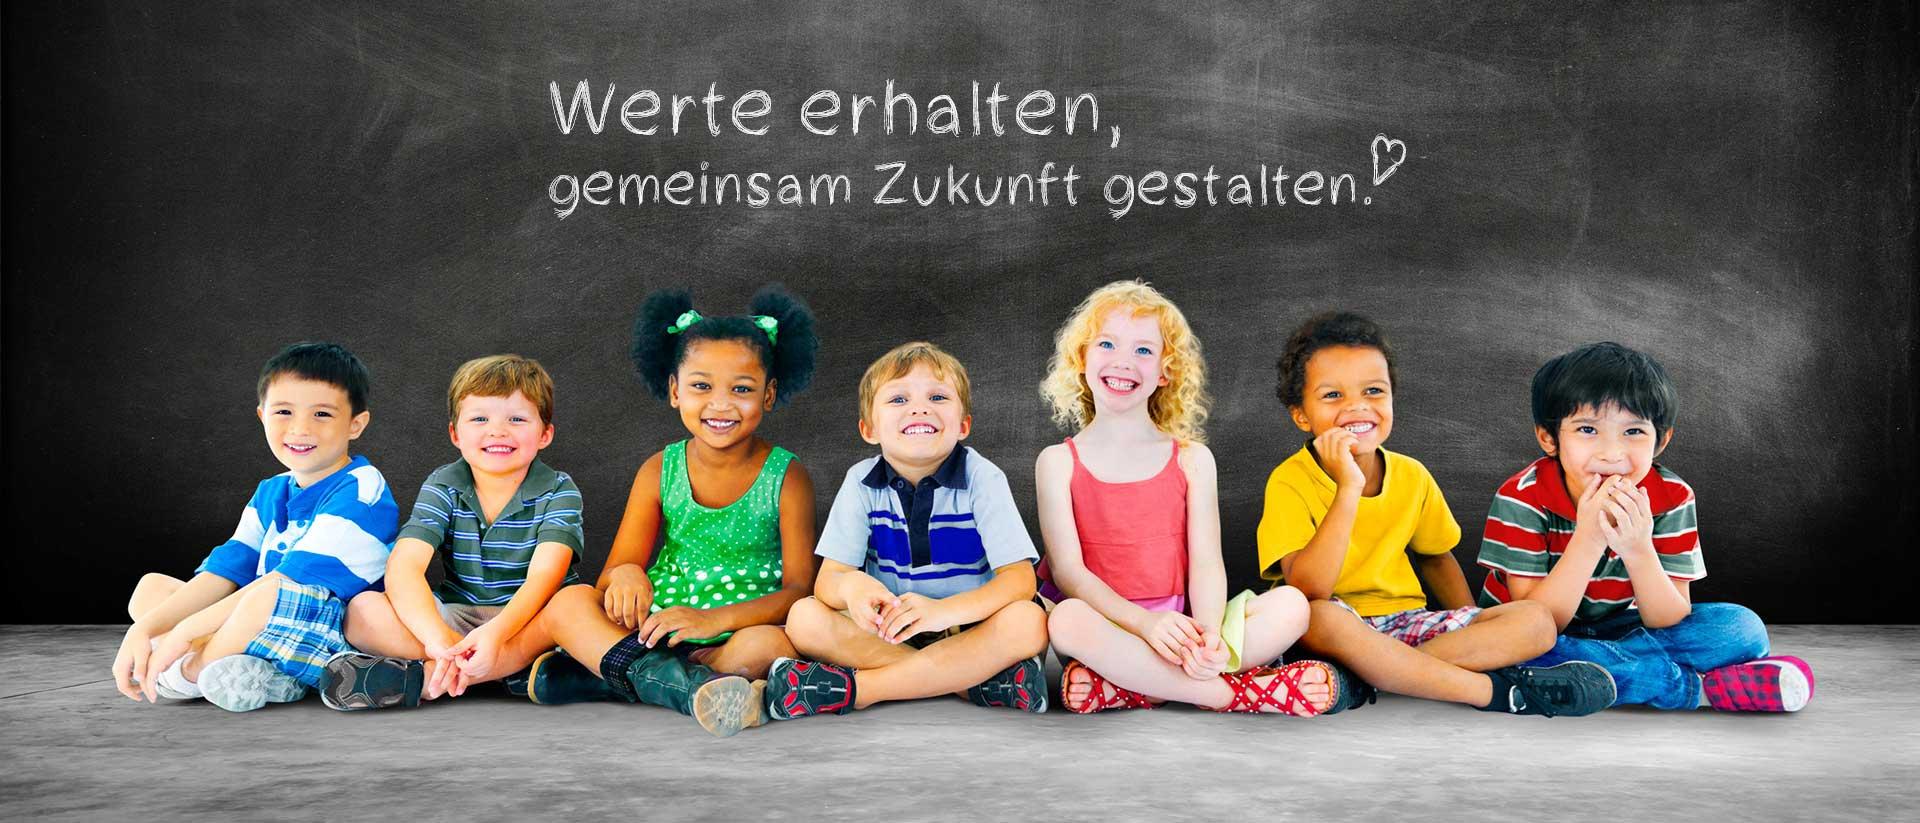 R.E. Immo GmbH Hausverwaltung